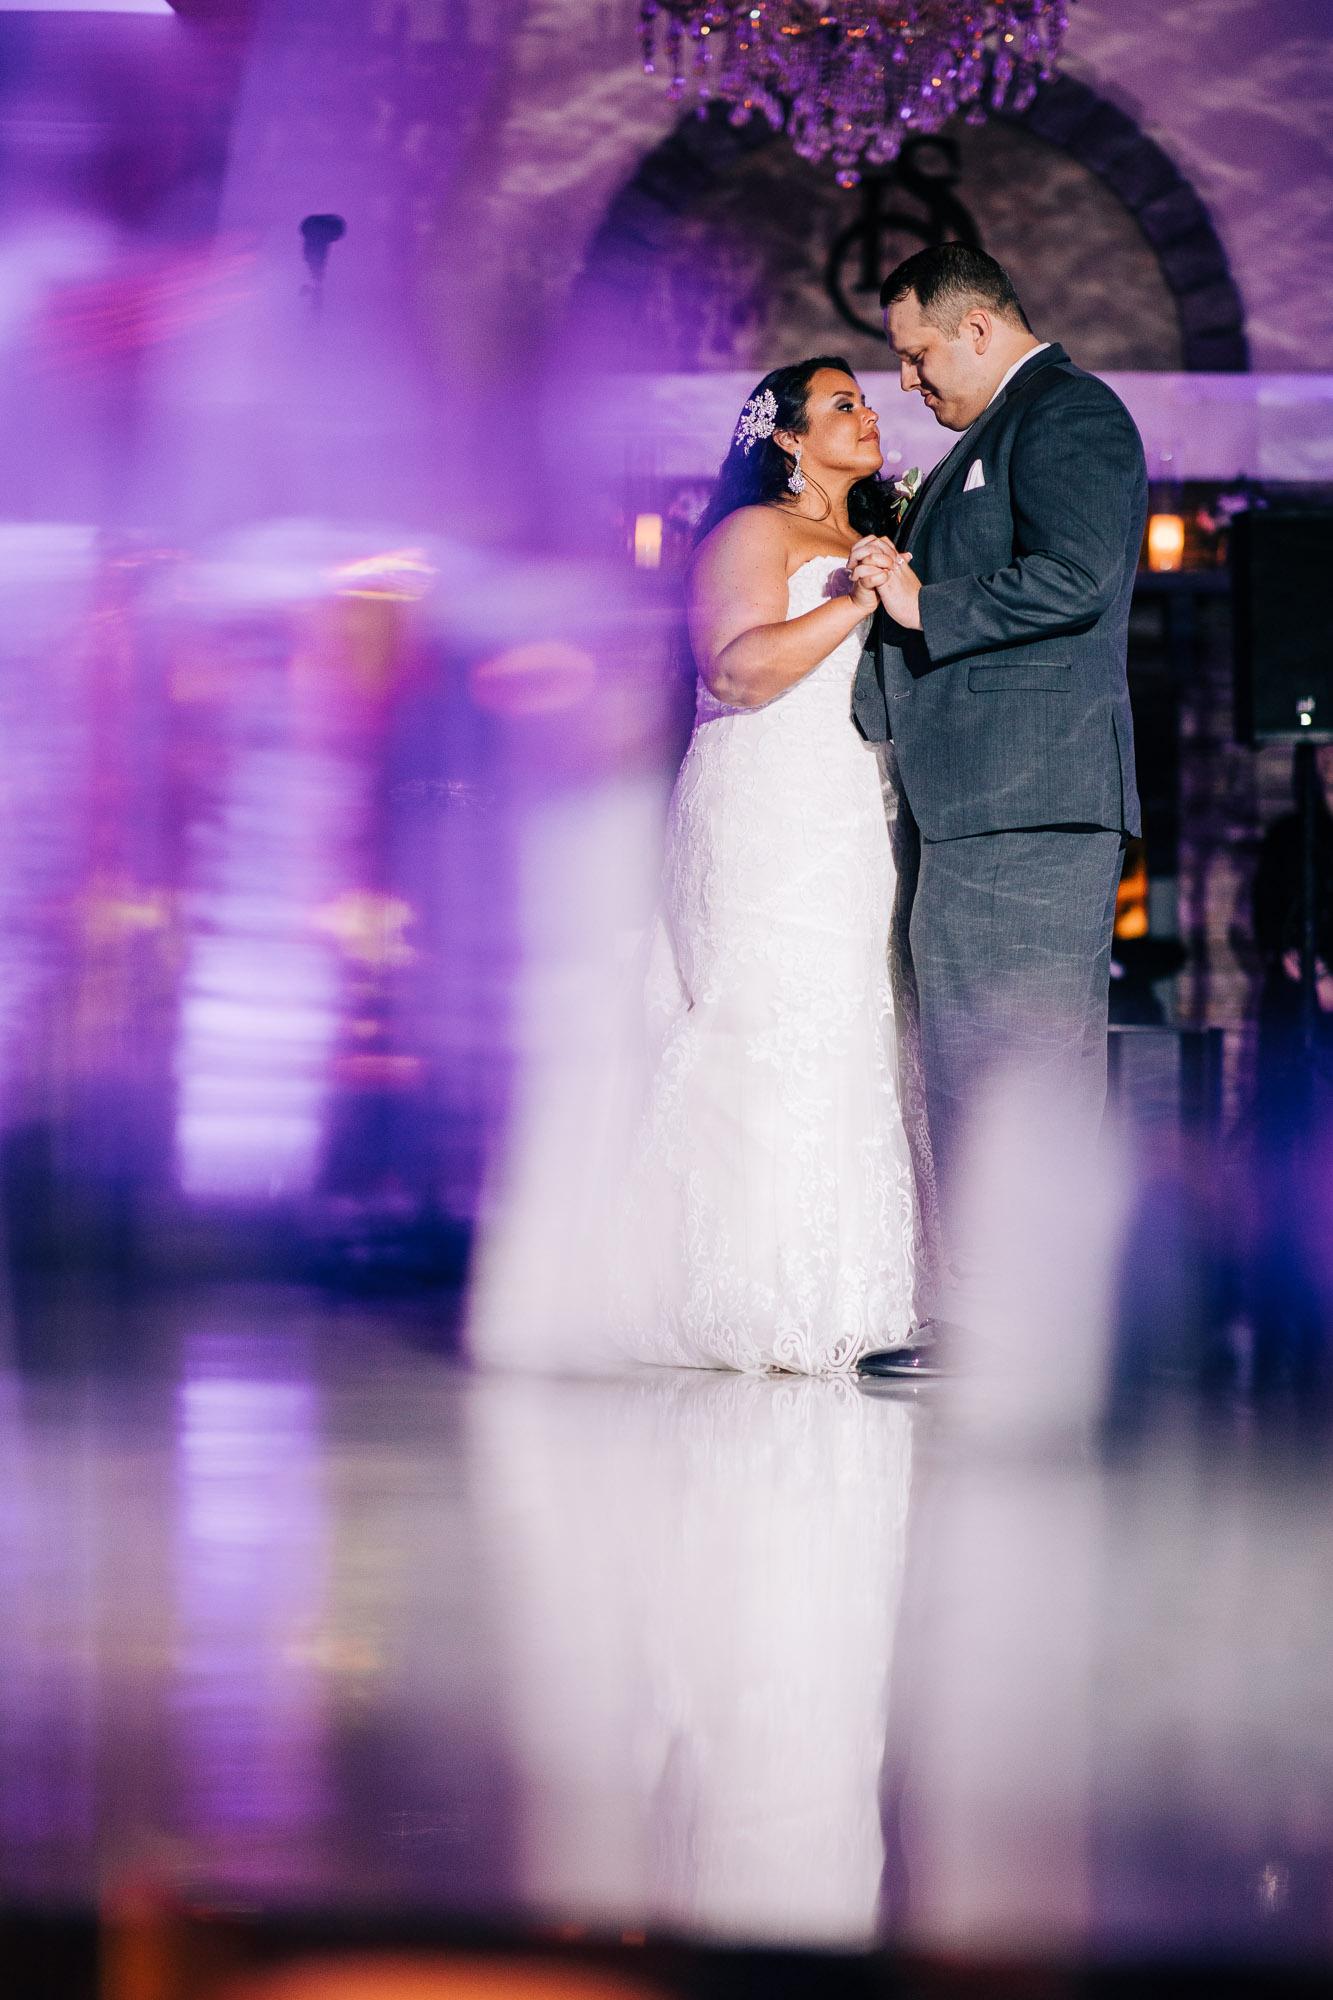 stonhedge-country-club-wedding-9234.jpg